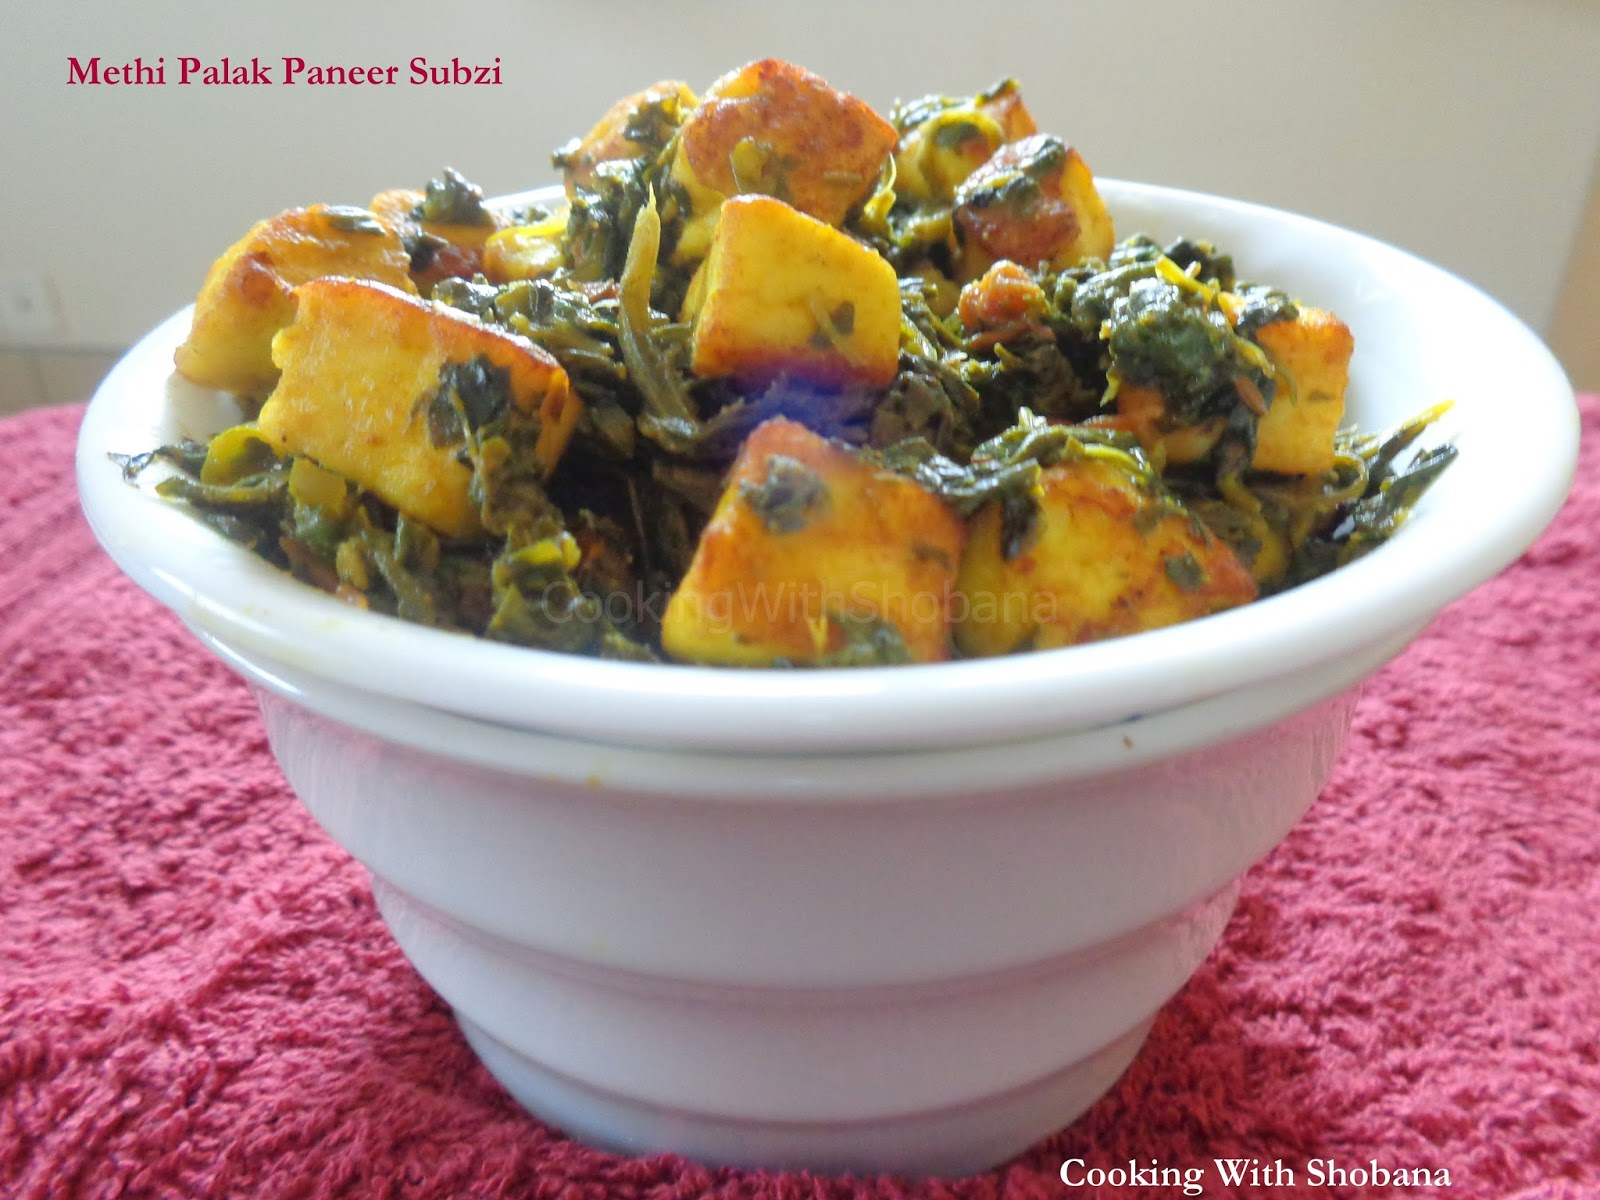 Cooking With Shobana : METHI PALAK PANEER SUBZI